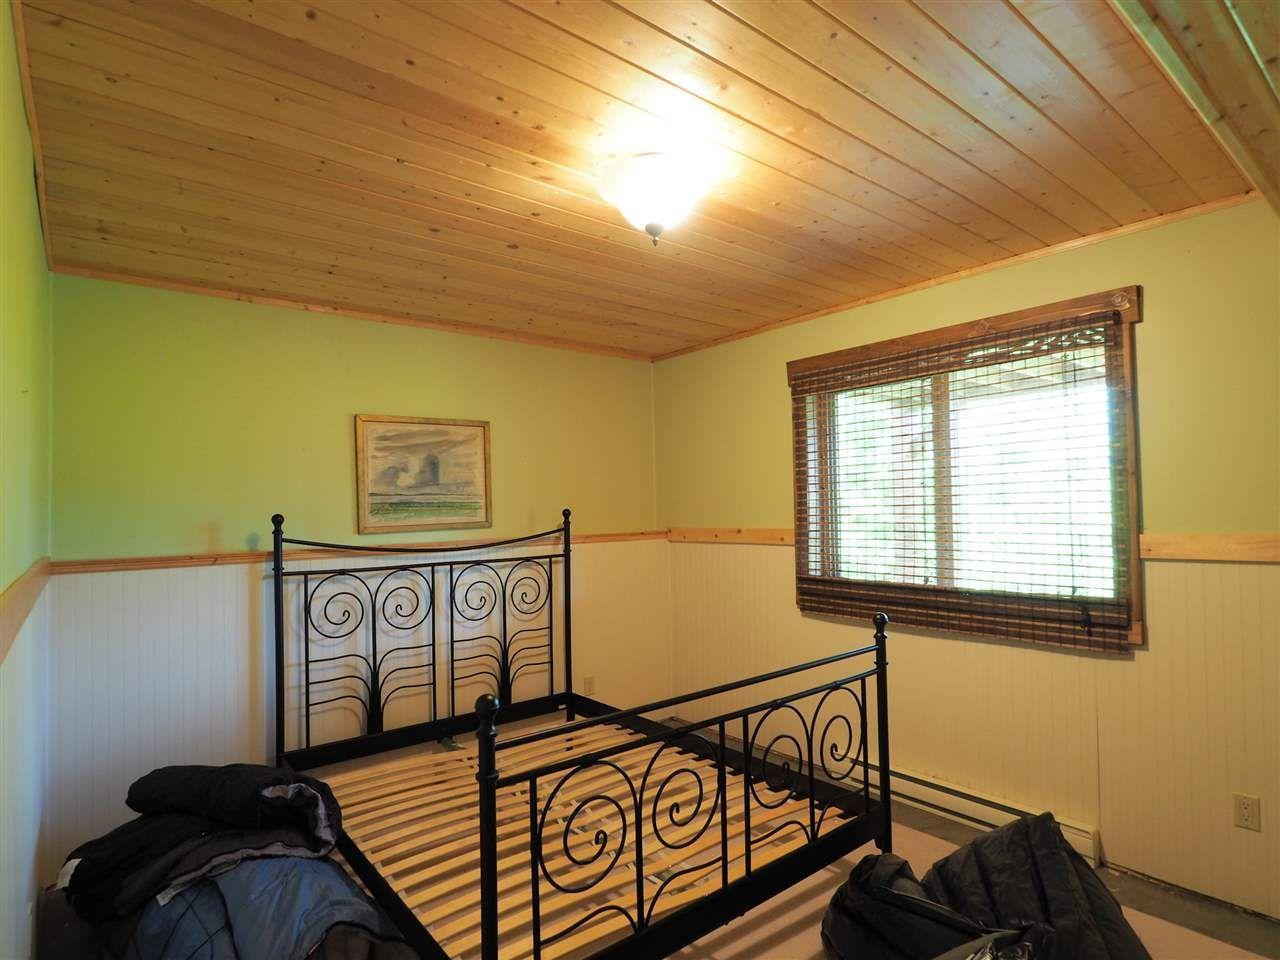 Photo 15: Photos: 4050 CANIM-HENDRIX LAKE Road in Canim Lake: Canim/Mahood Lake House for sale (100 Mile House (Zone 10))  : MLS®# R2396282